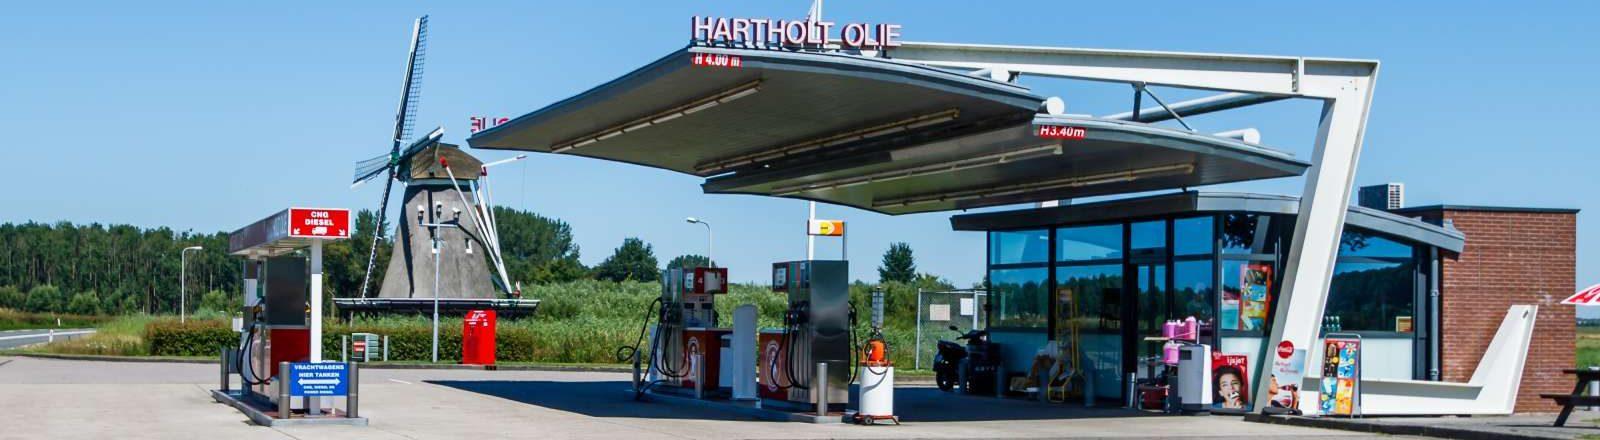 hartholtolie-tankstation-windesheim